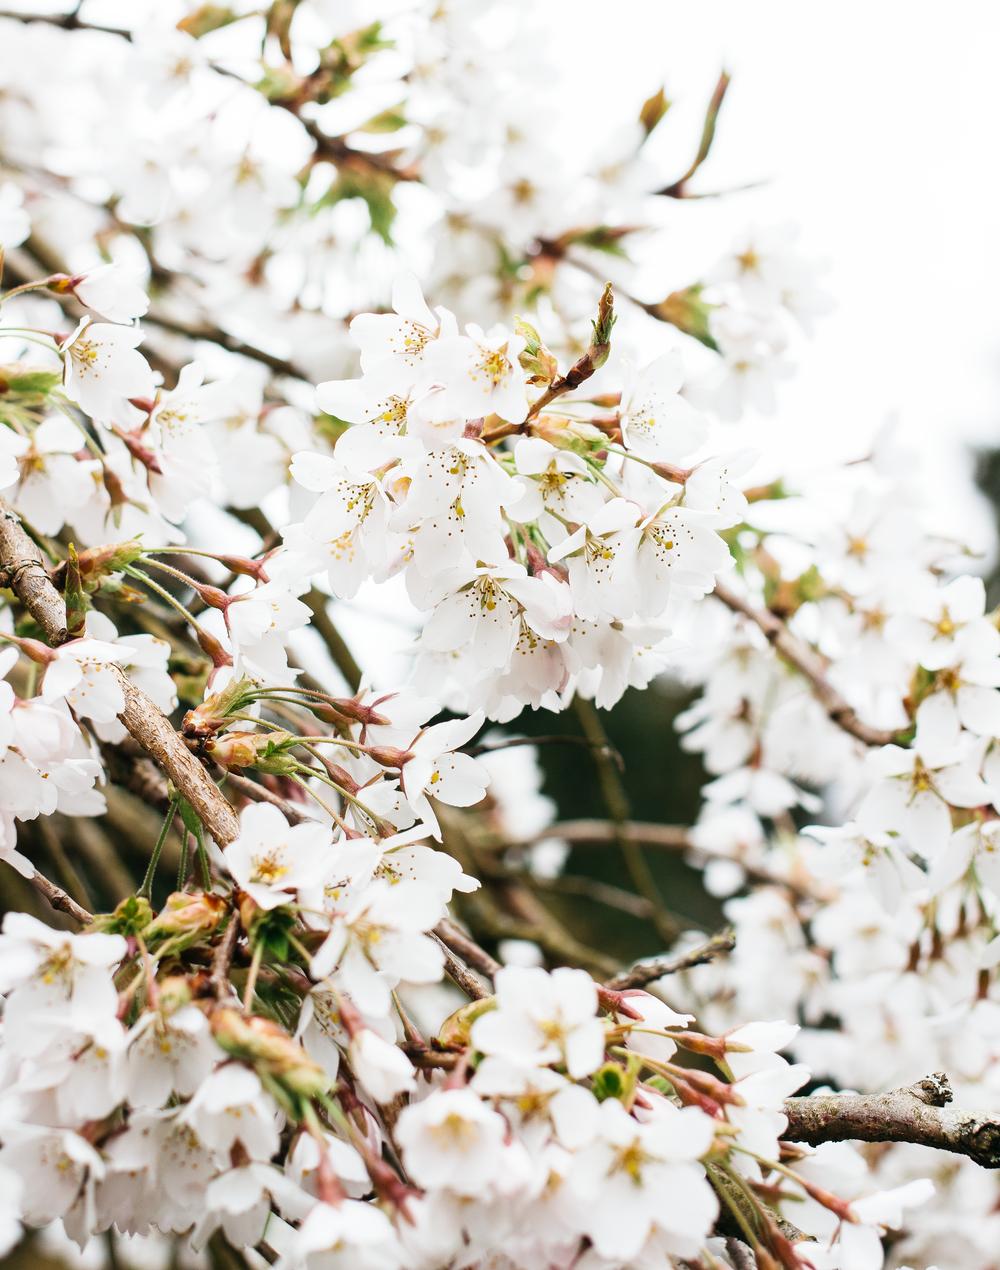 Spring-1.png